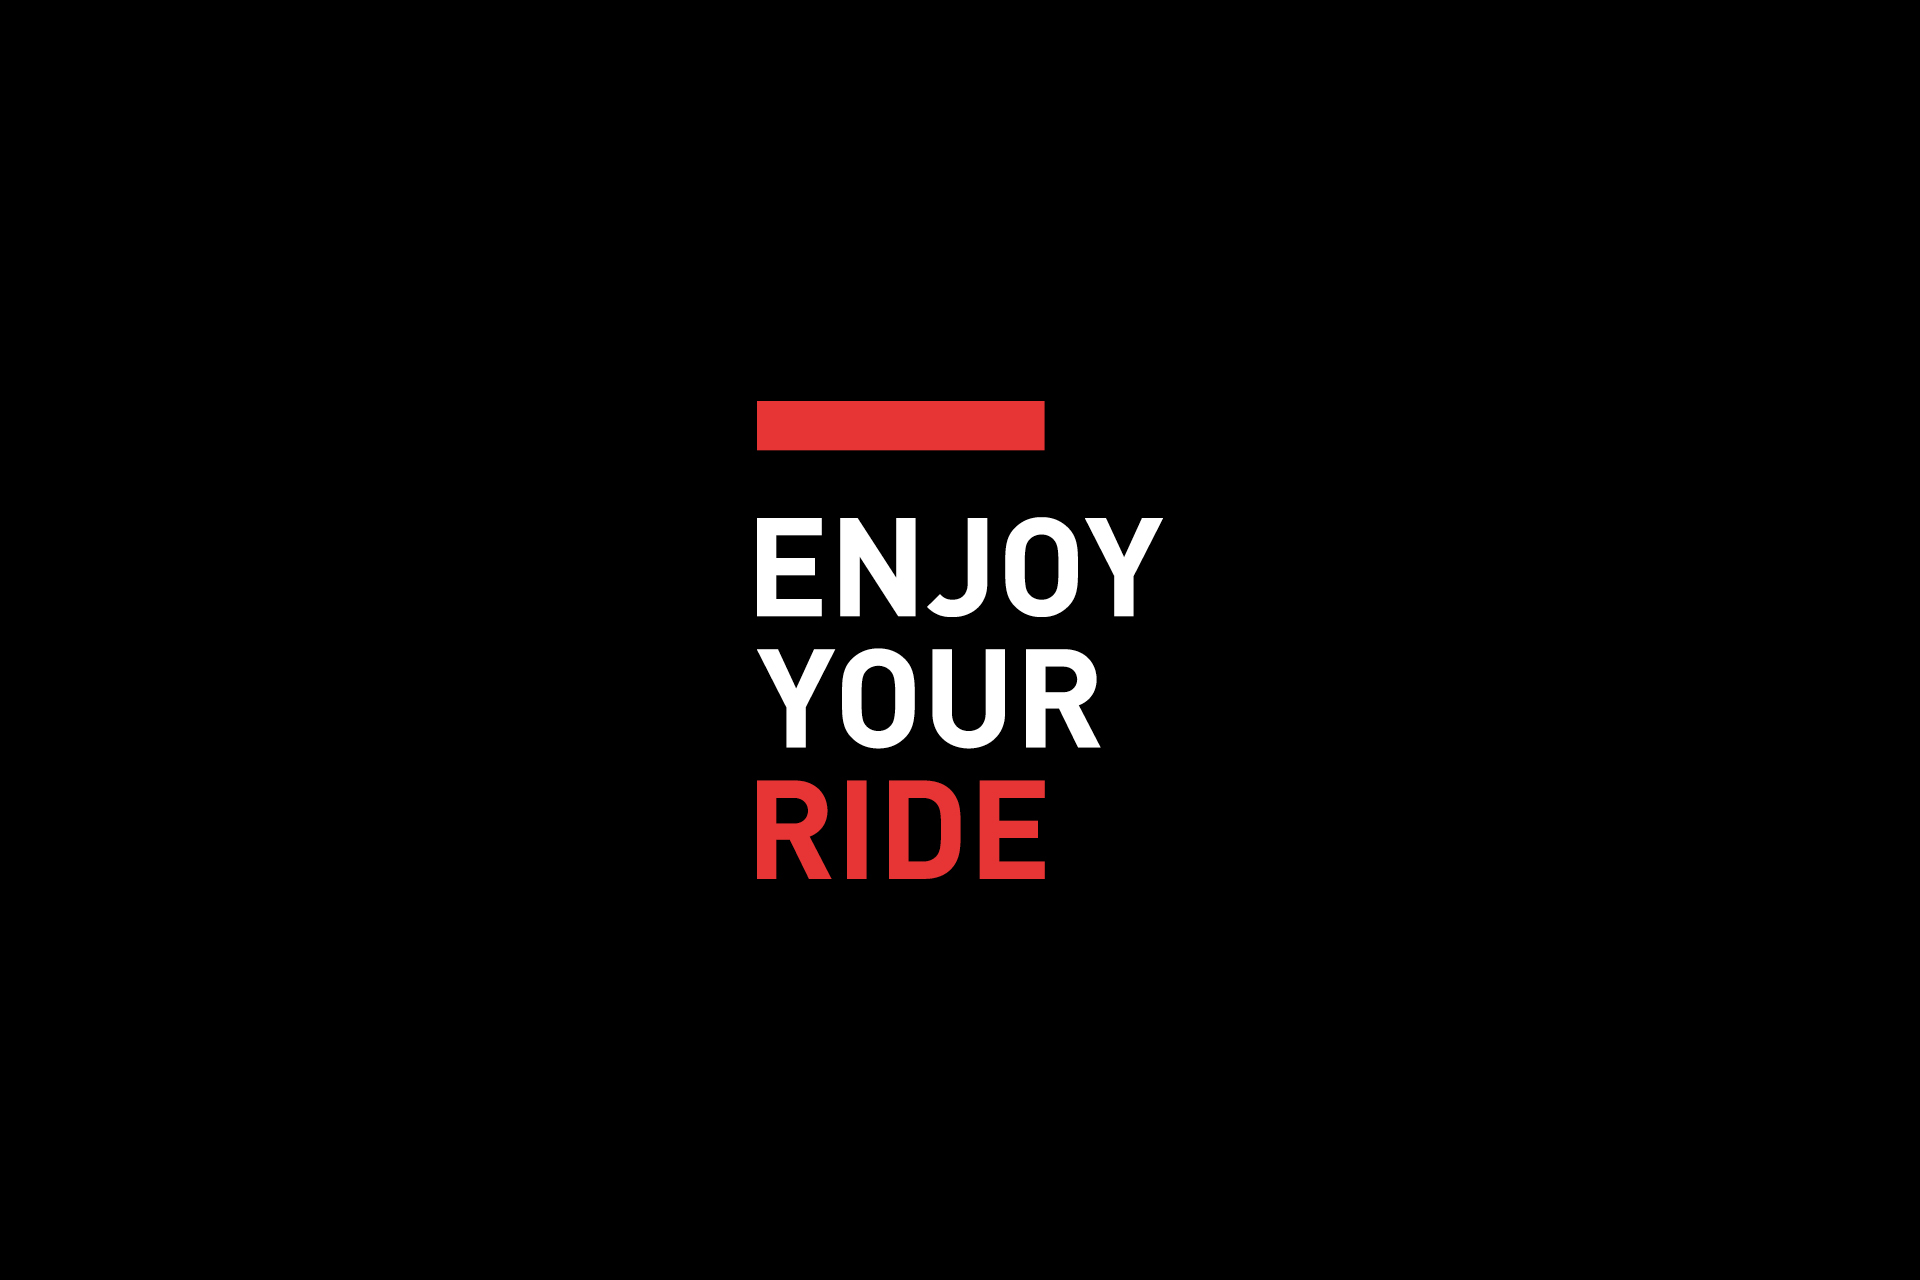 SelleItalia-enjoyouride-logo2.jpg